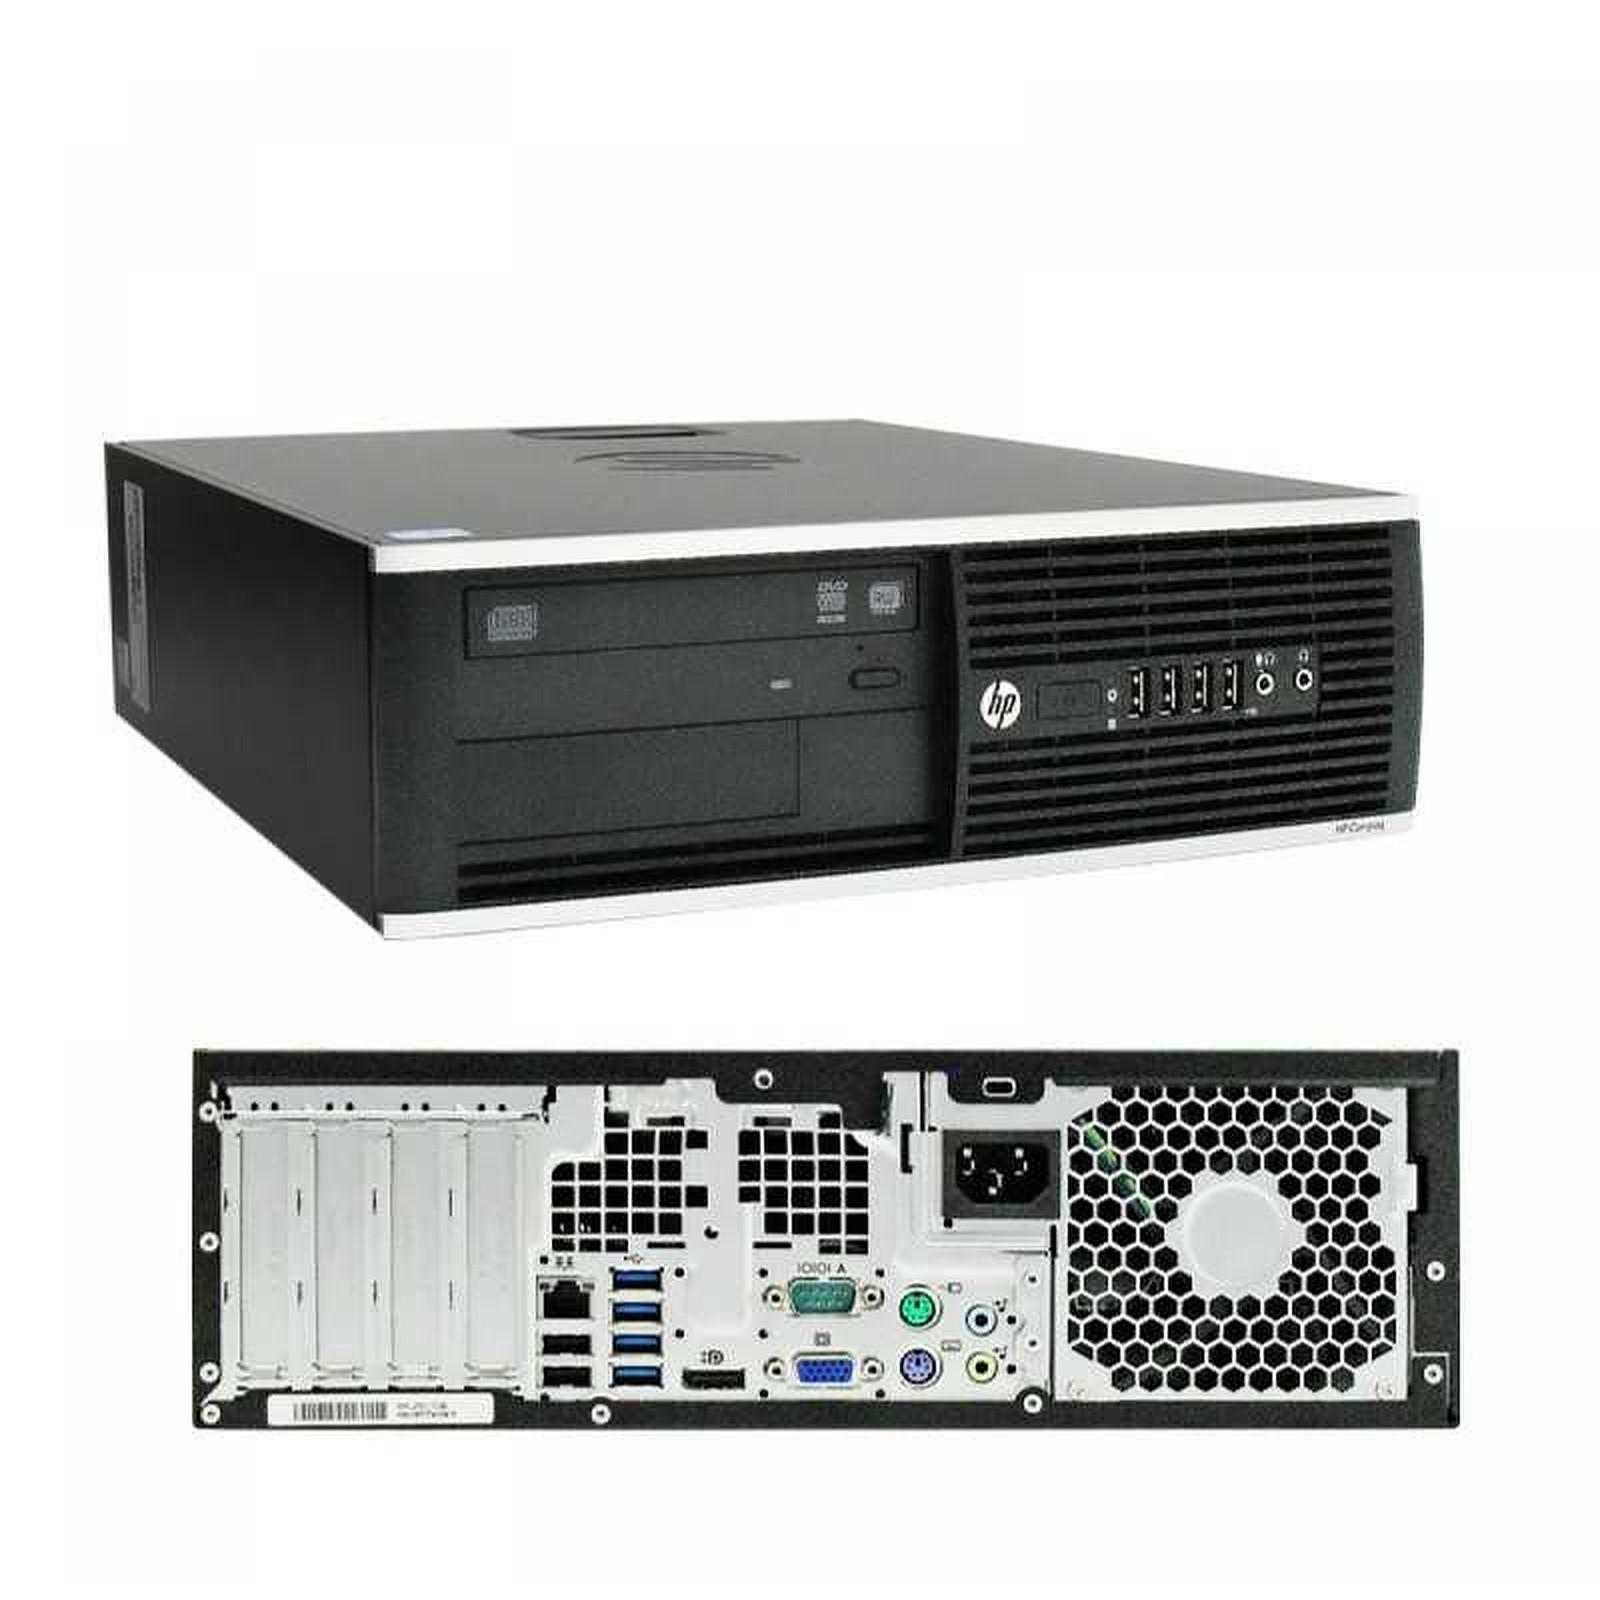 HP Compaq Elite 8300 SFF Core i5 3,2 GHz - HDD 2 To RAM 4 Go